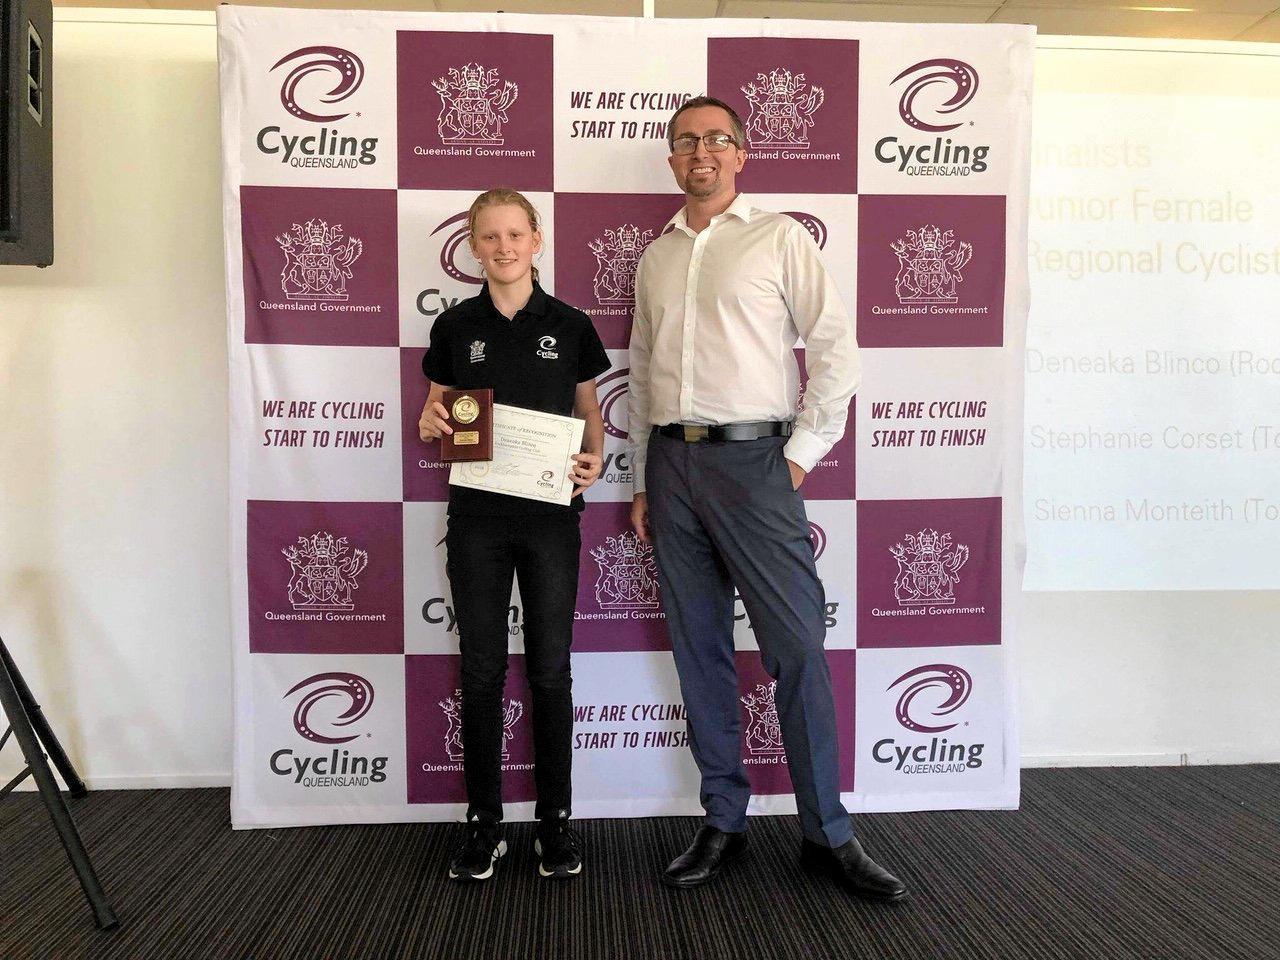 Rockhampton's Deneaka Blinco receives the Junior Regional Cyclist of the Year award from Cycling Queensland's CEO Sean Muir.